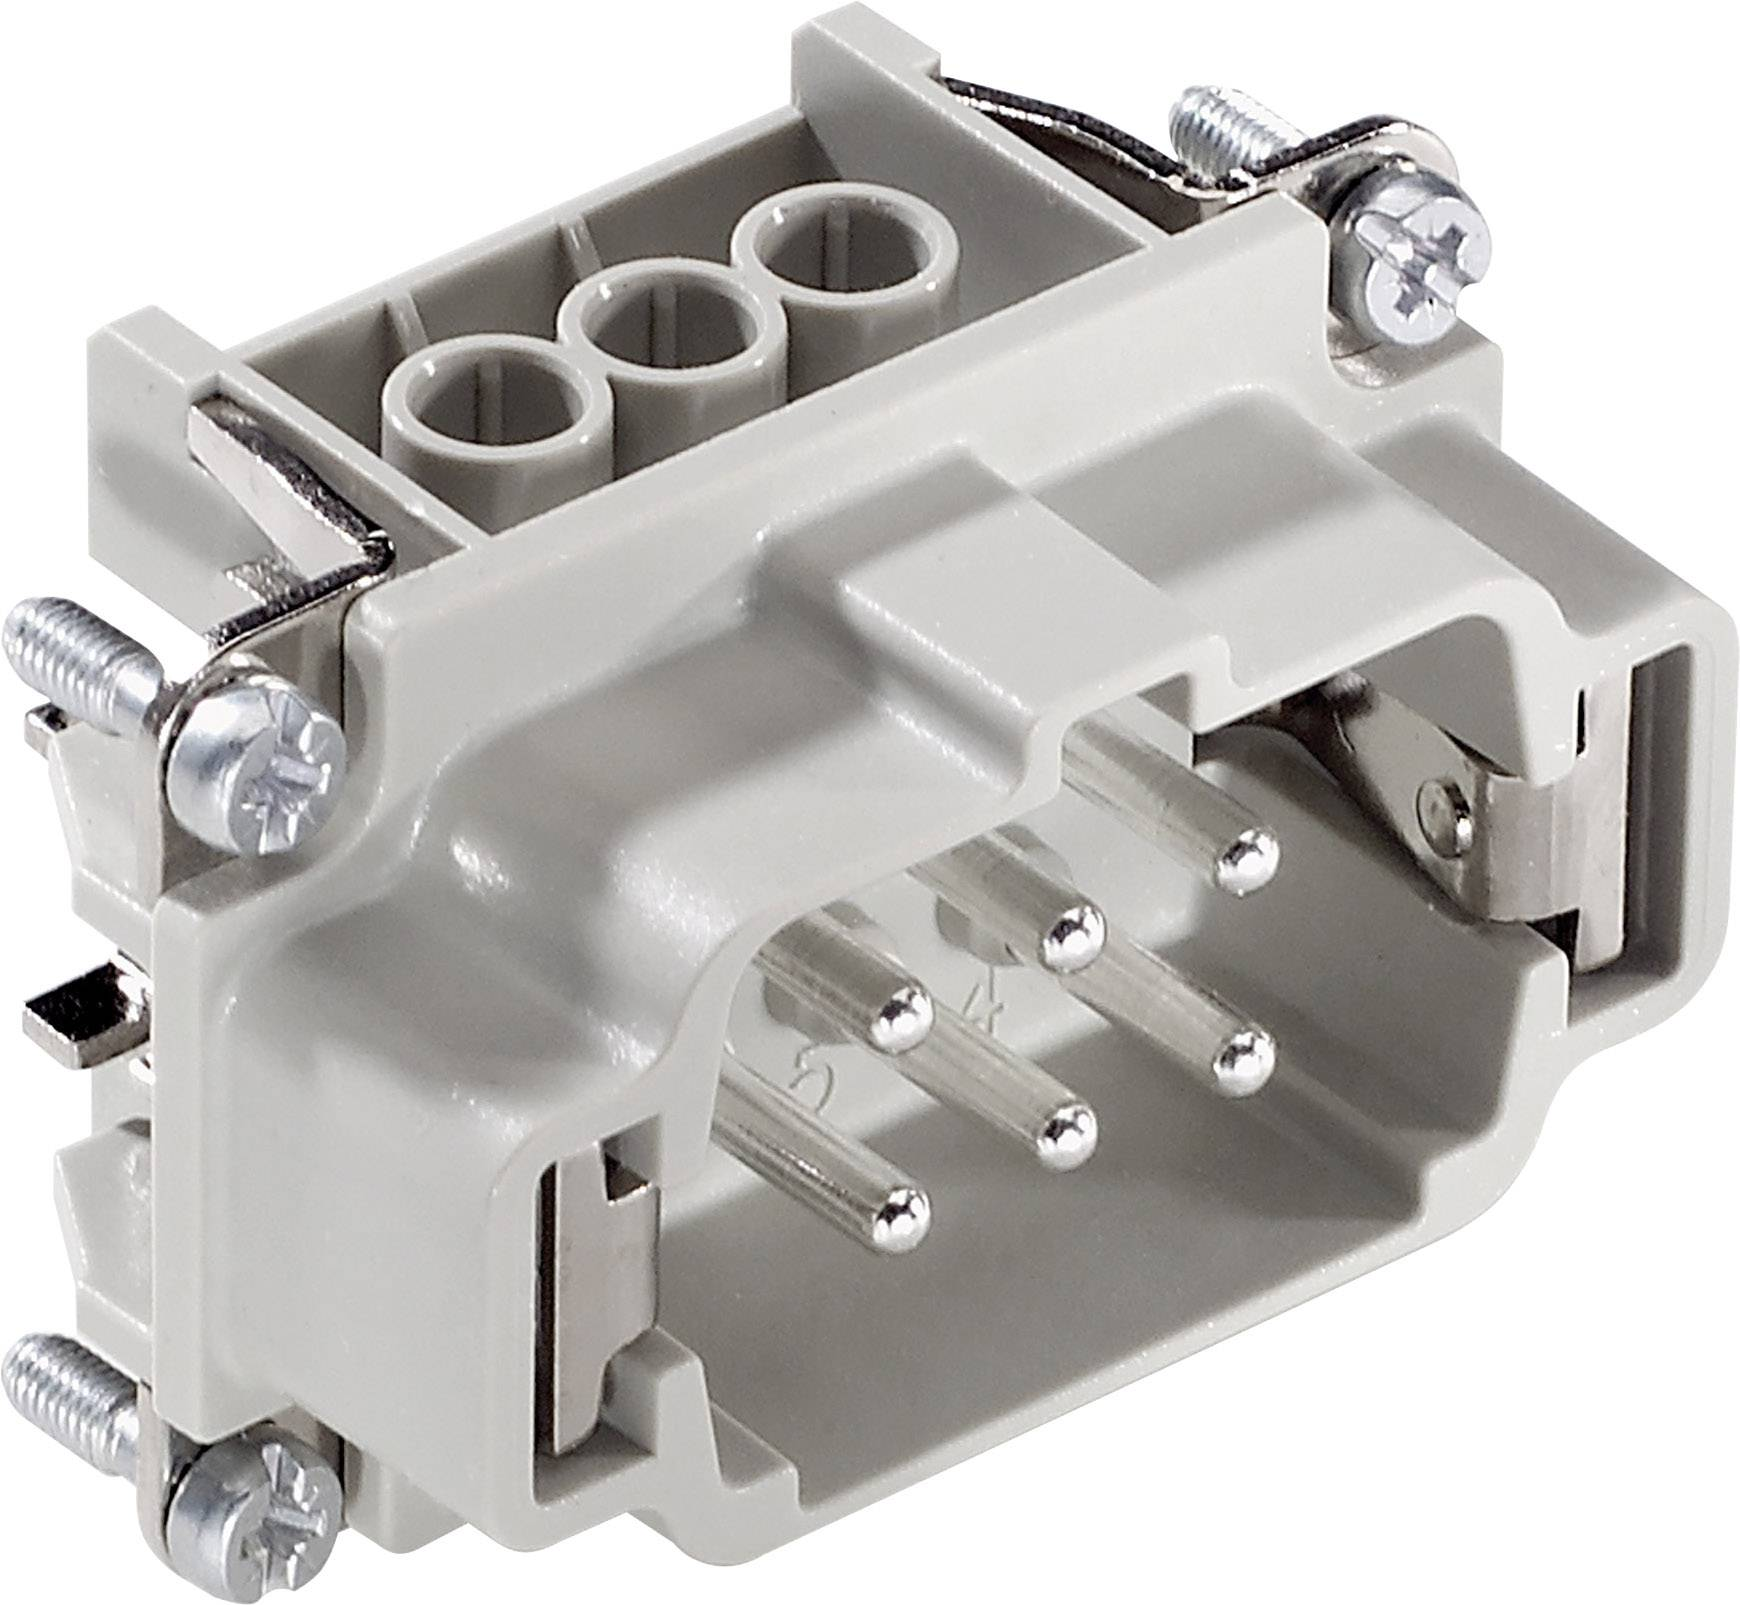 Vložka pinového konektoru EPIC® H-B 6 10190000 LappKabel počet kontaktů 6 + PE 1 ks